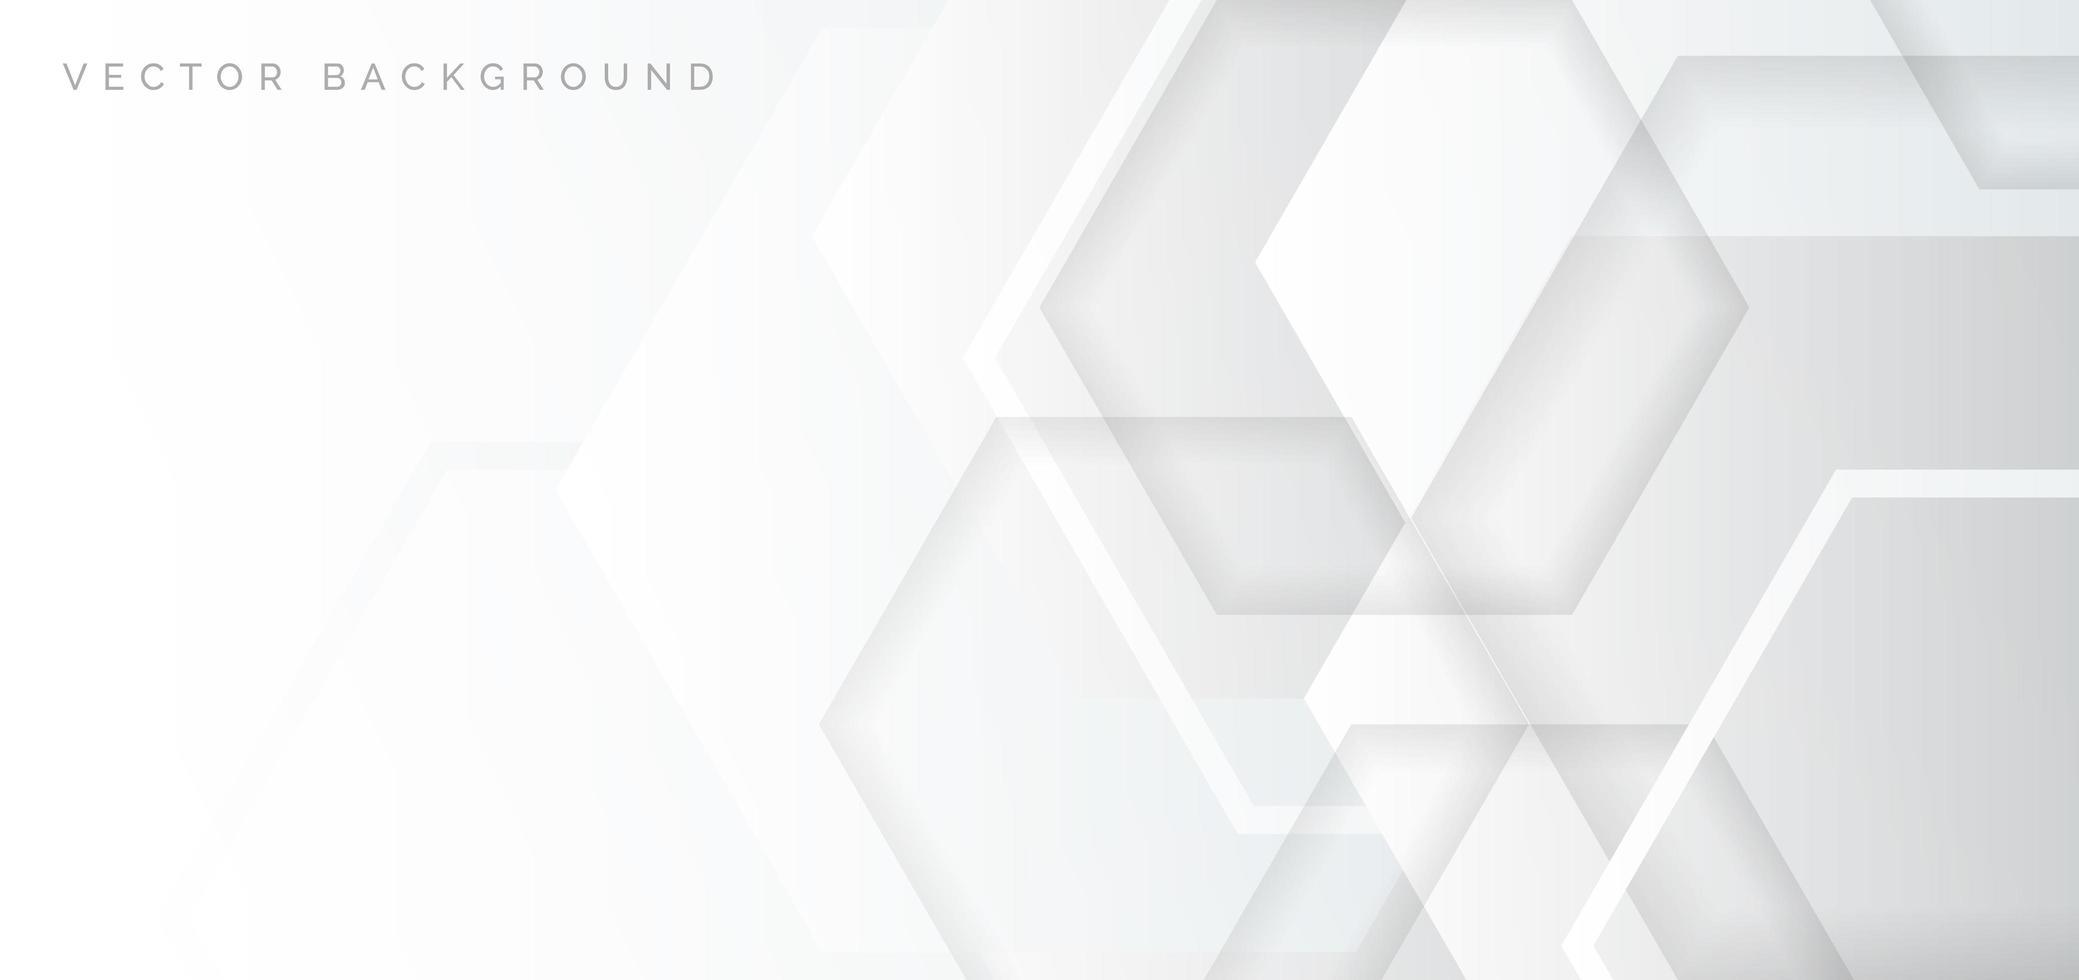 banner hexagonal superpuesto geométrico blanco, gris vector